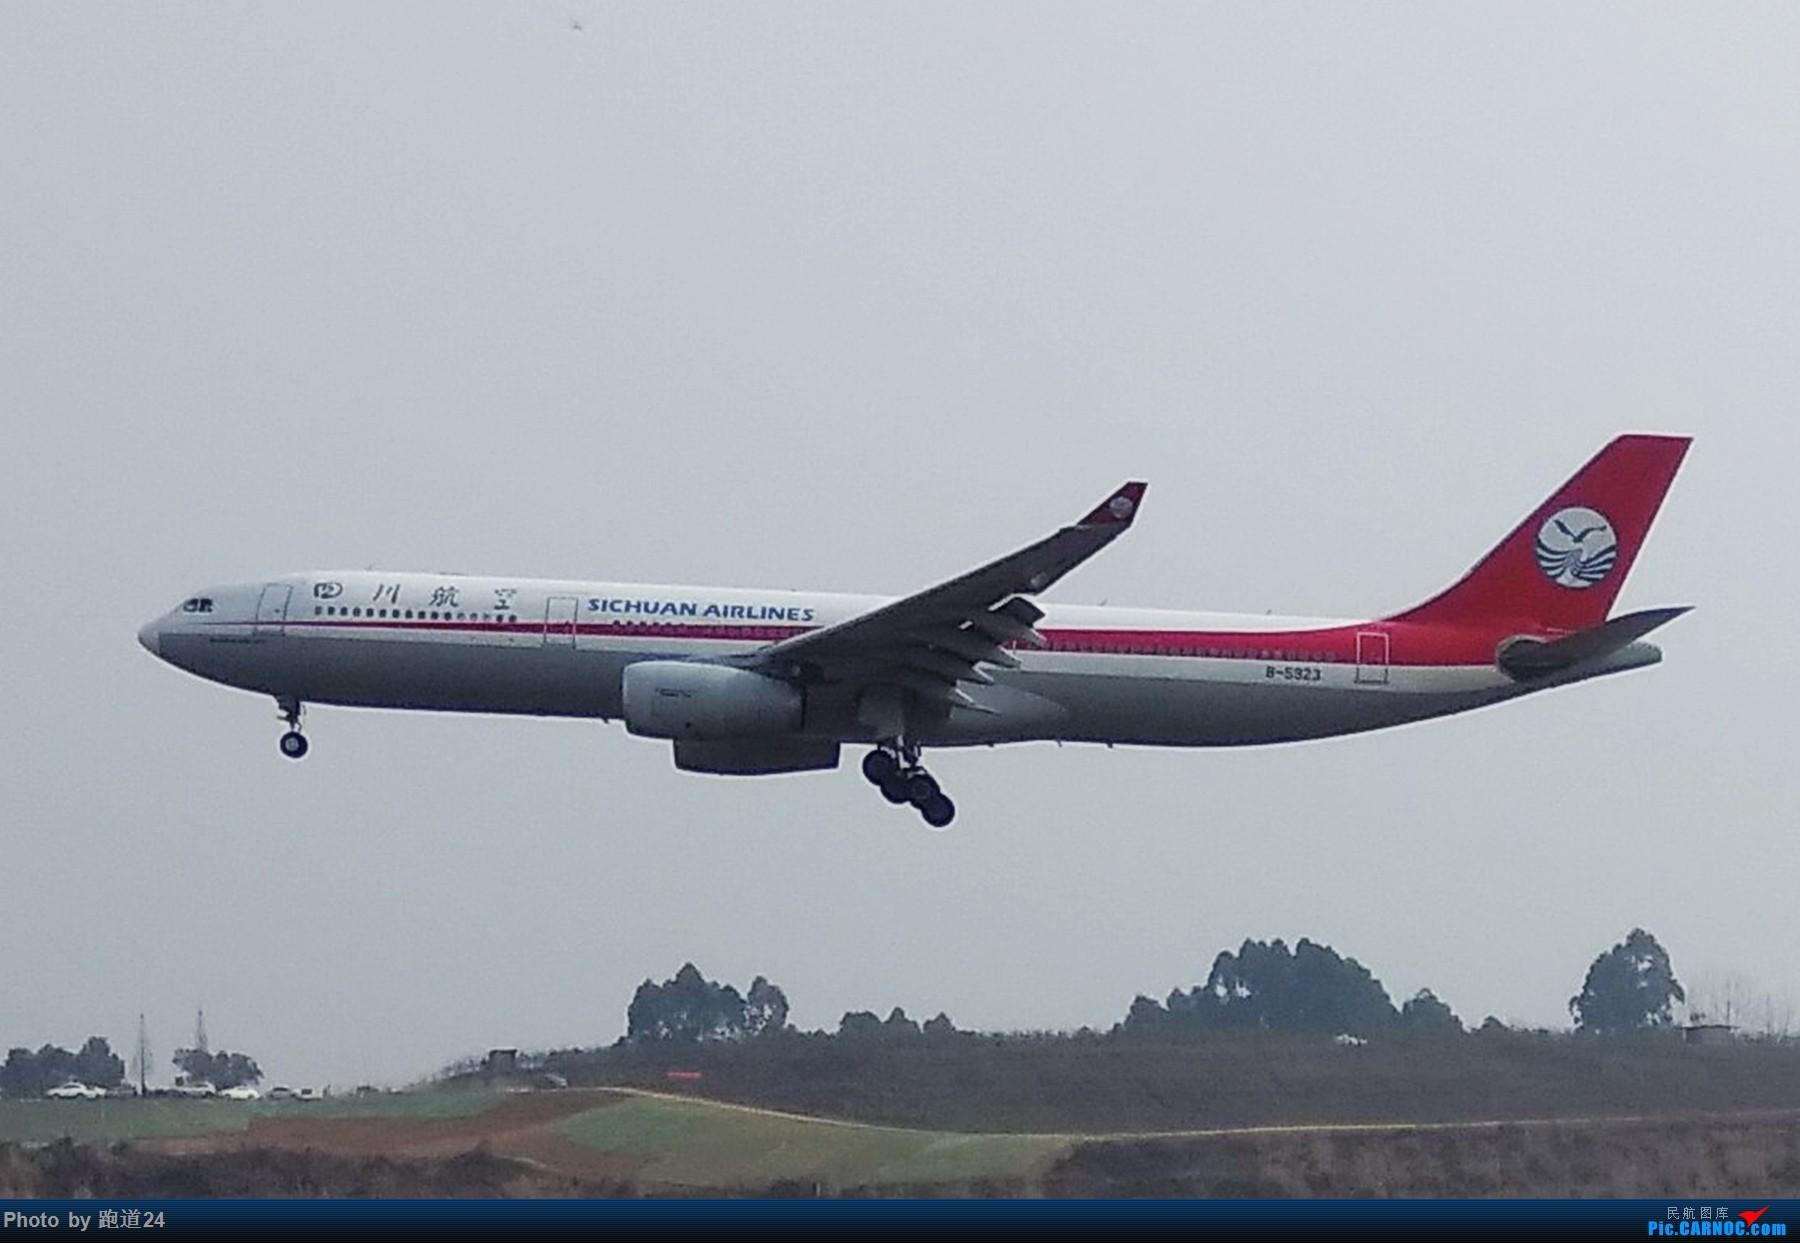 Re:[原创]【多图党】2018年首次探访CTU 手机拍摄,大家见谅。 AIRBUS A330-300 B-5923 中国成都双流国际机场